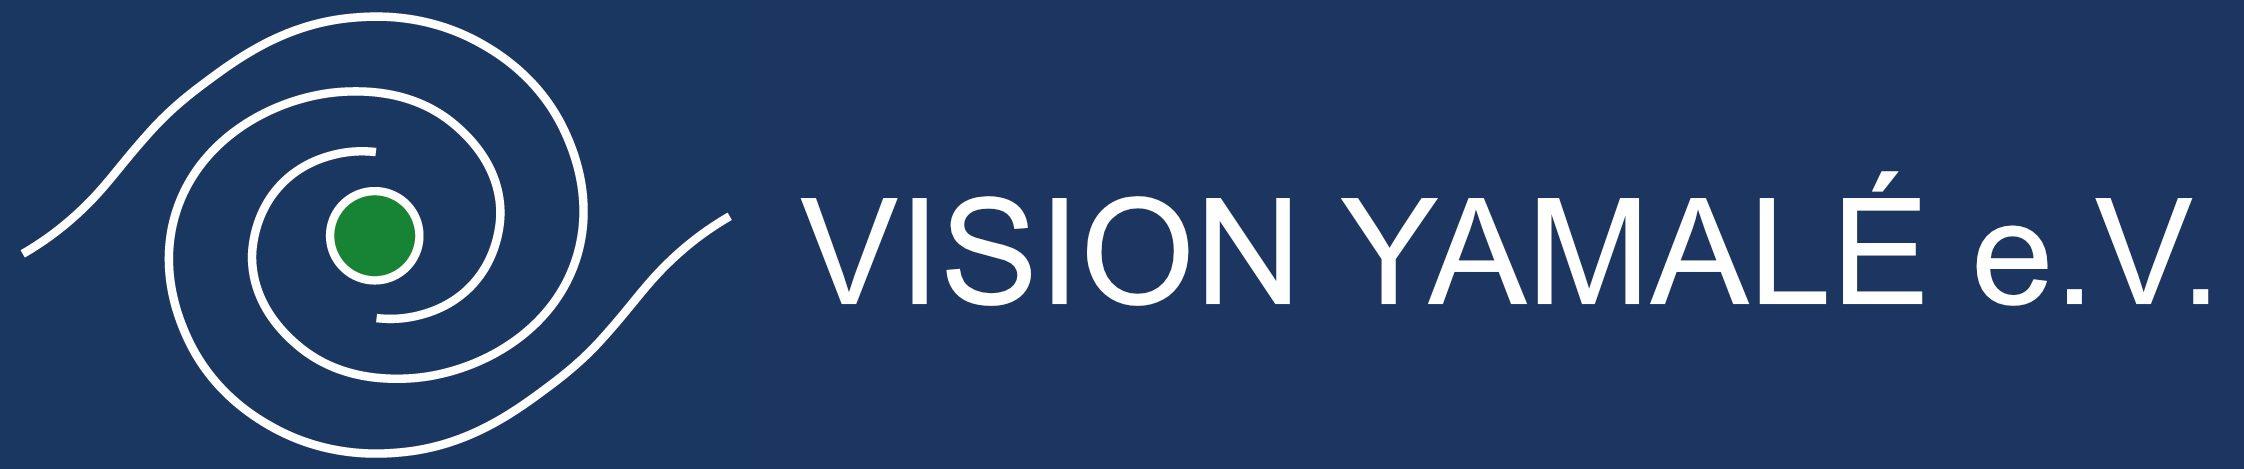 Vision Yamale e.V.